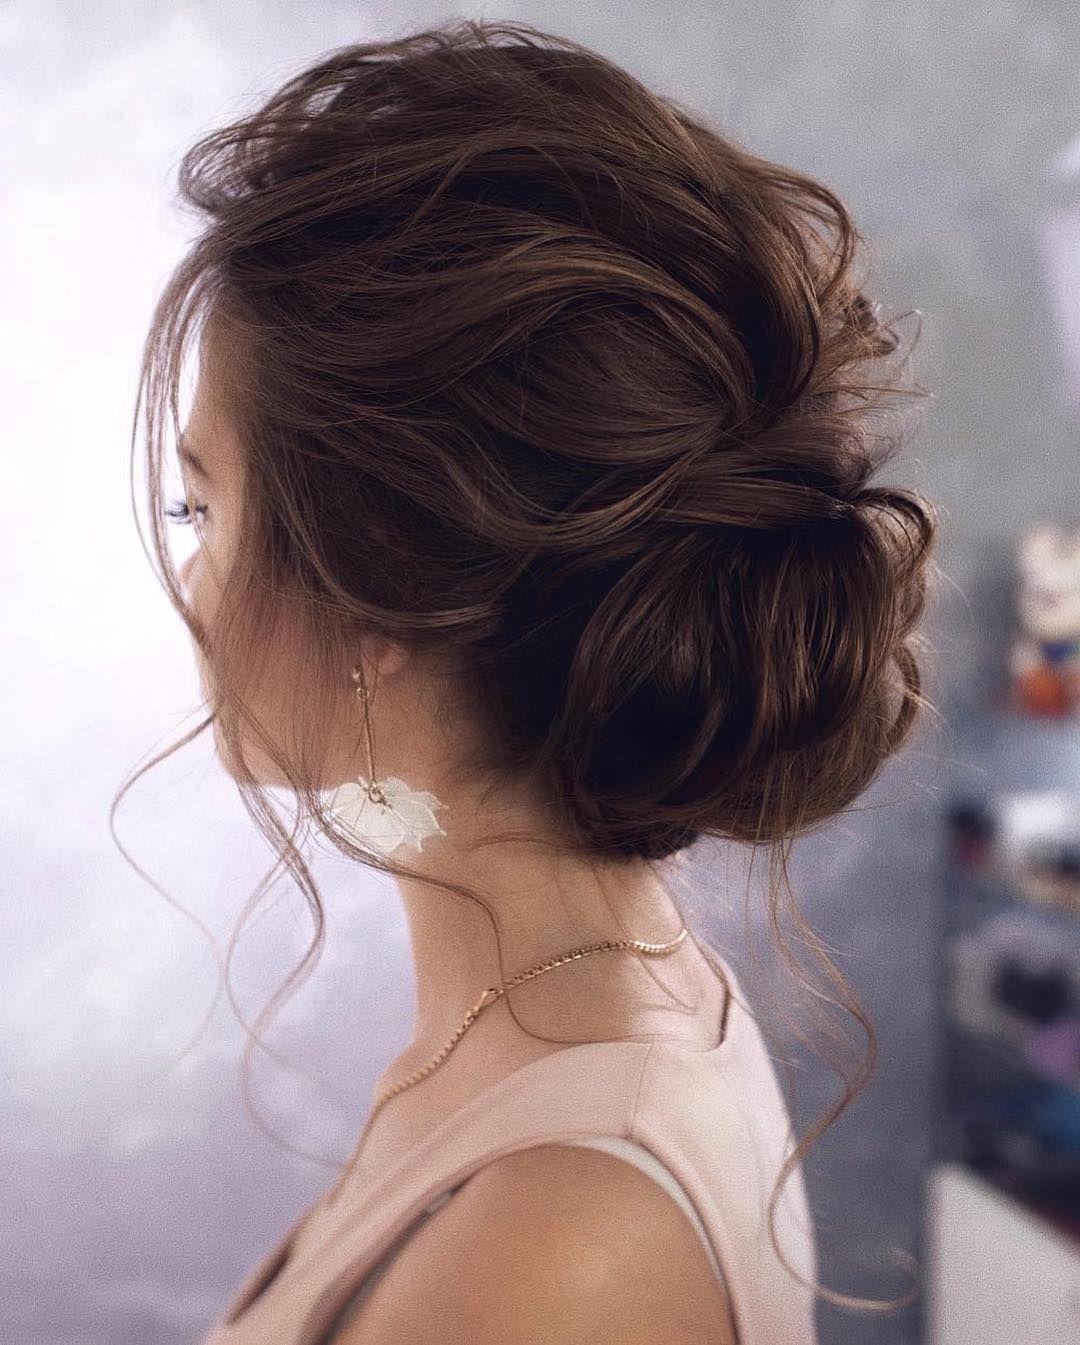 Astounding Asian Hairstyles Updo Long Shorts 1950S Hairstyles 50S Schematic Wiring Diagrams Amerangerunnerswayorg